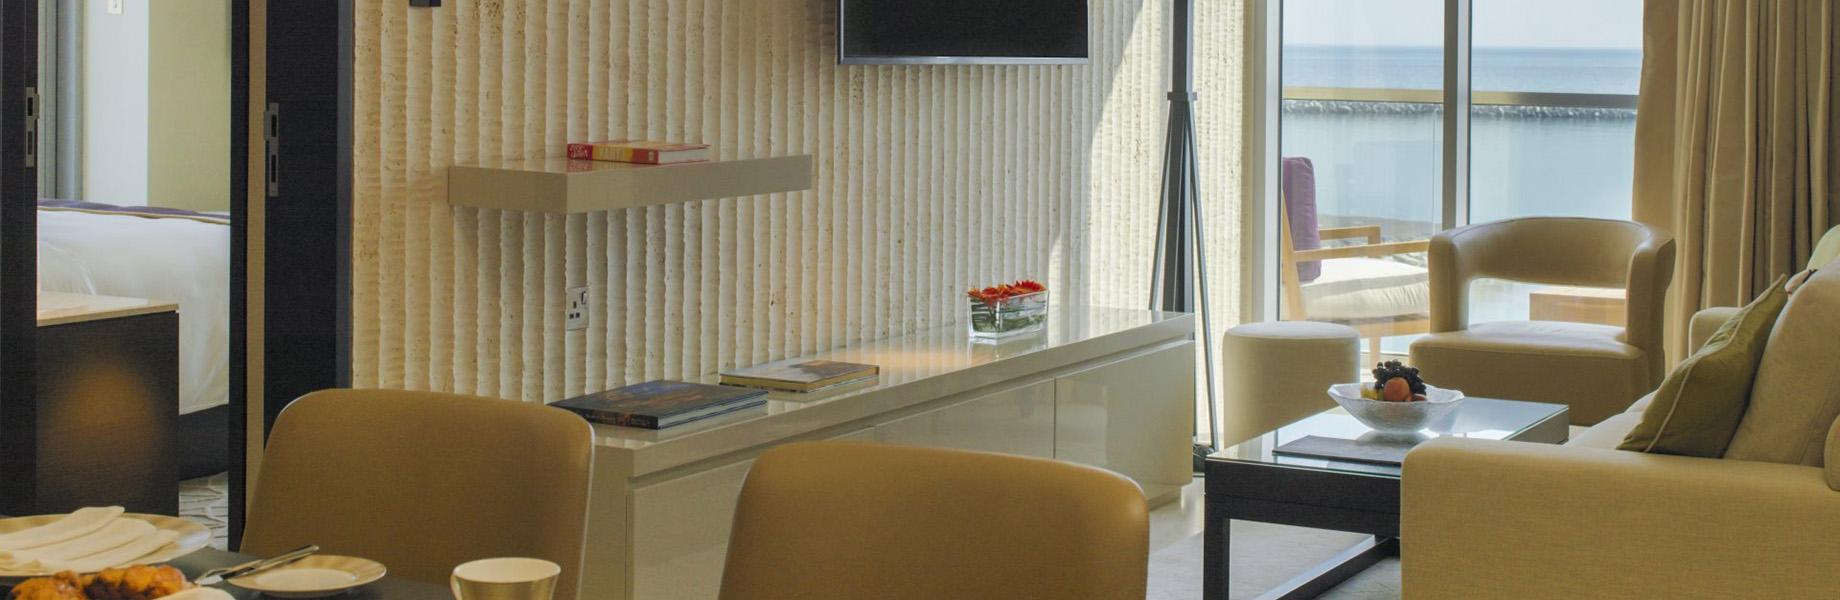 Lithos Design Kempinski Hotel Muscat interior stone hotel design